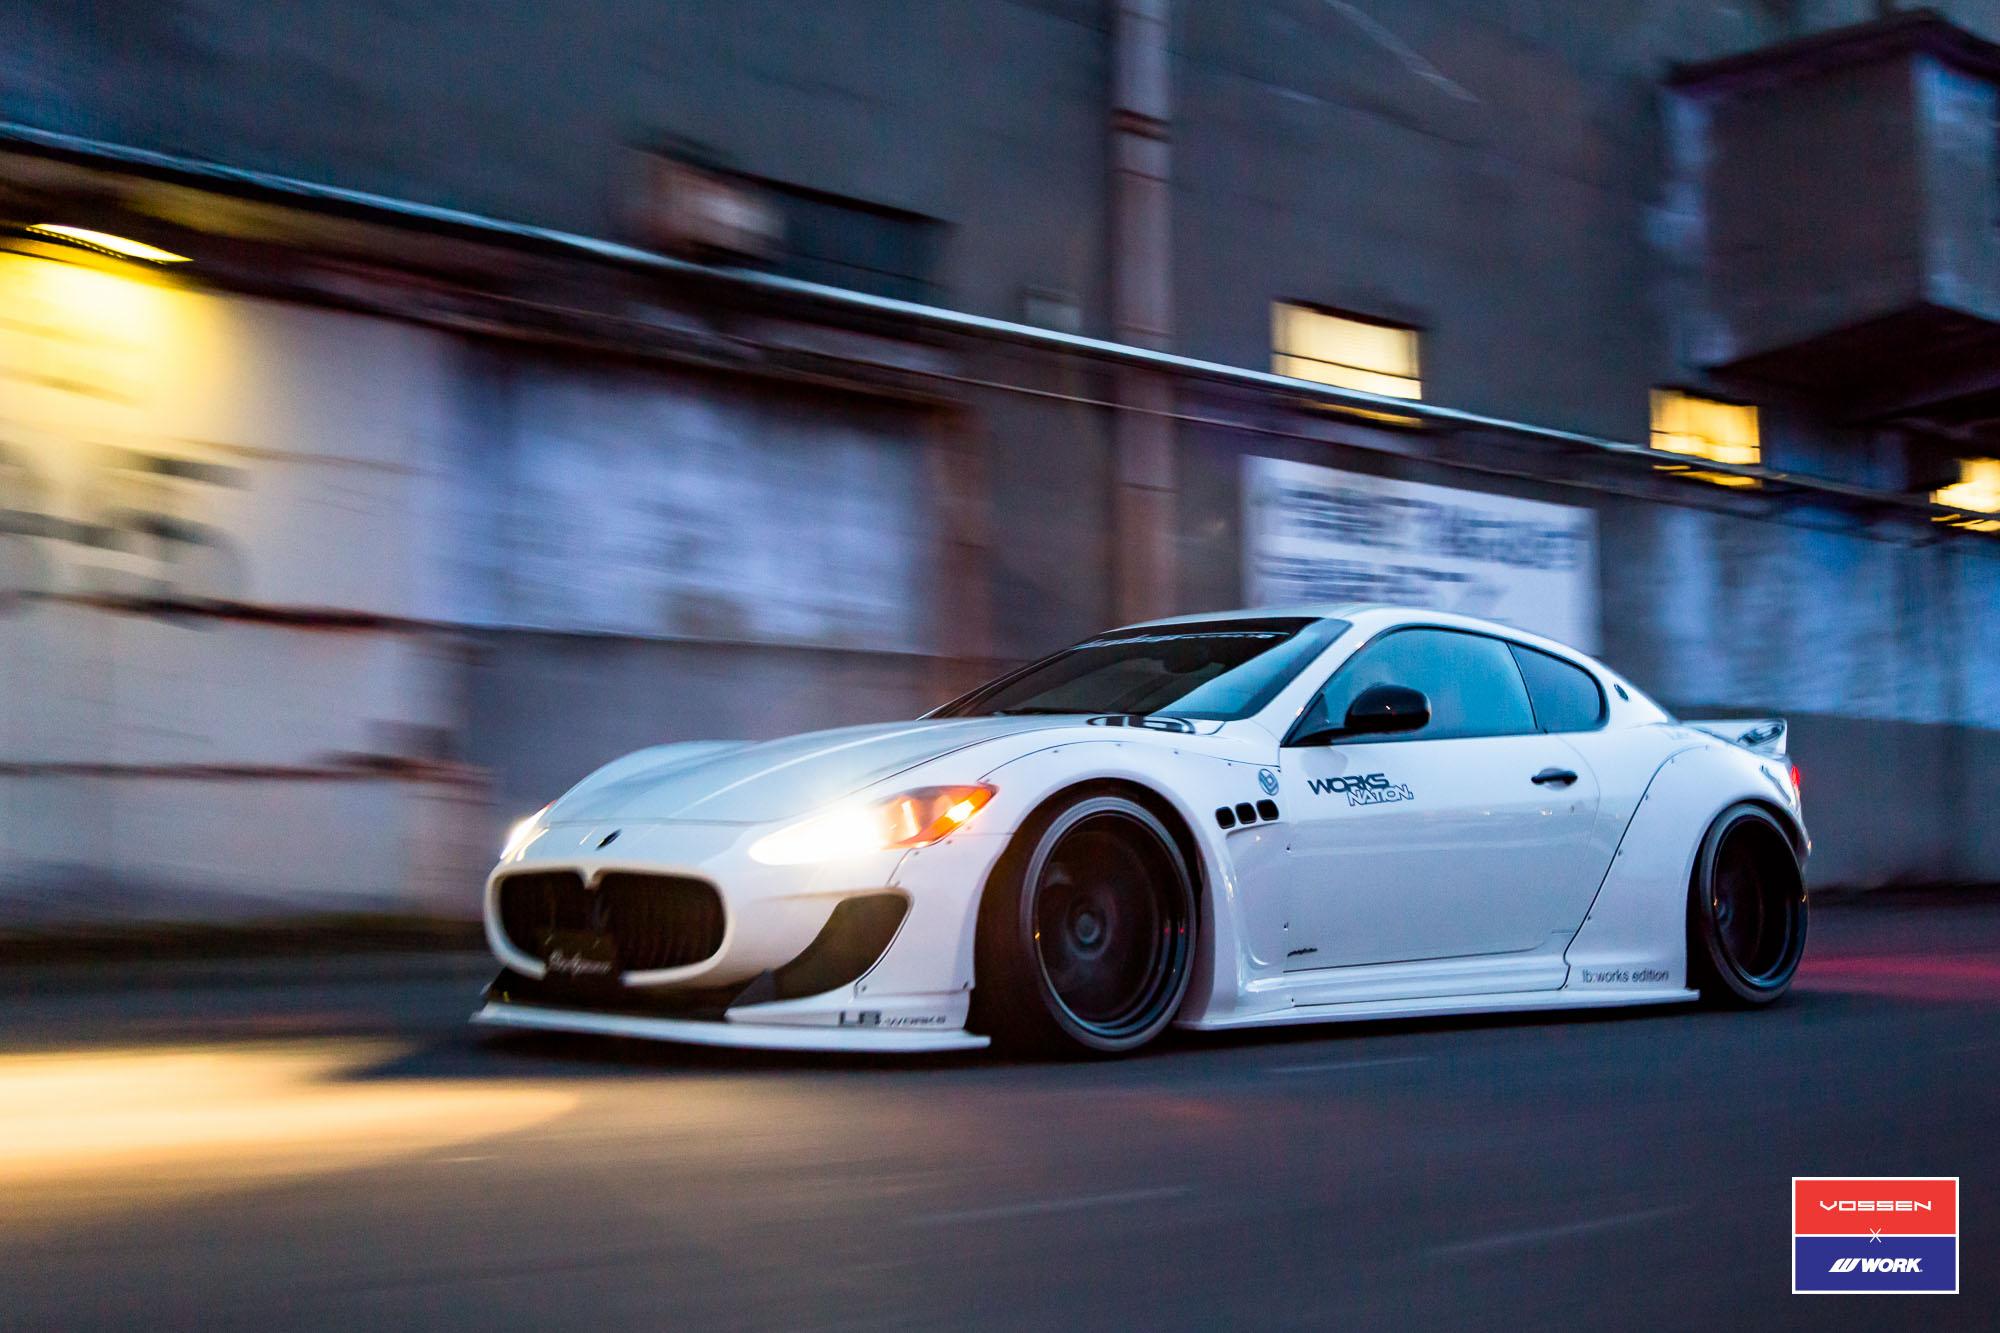 Liberty Walk Maserati Granturismo In White Gets Custom Stance And Vossen Wheels Autoevolution